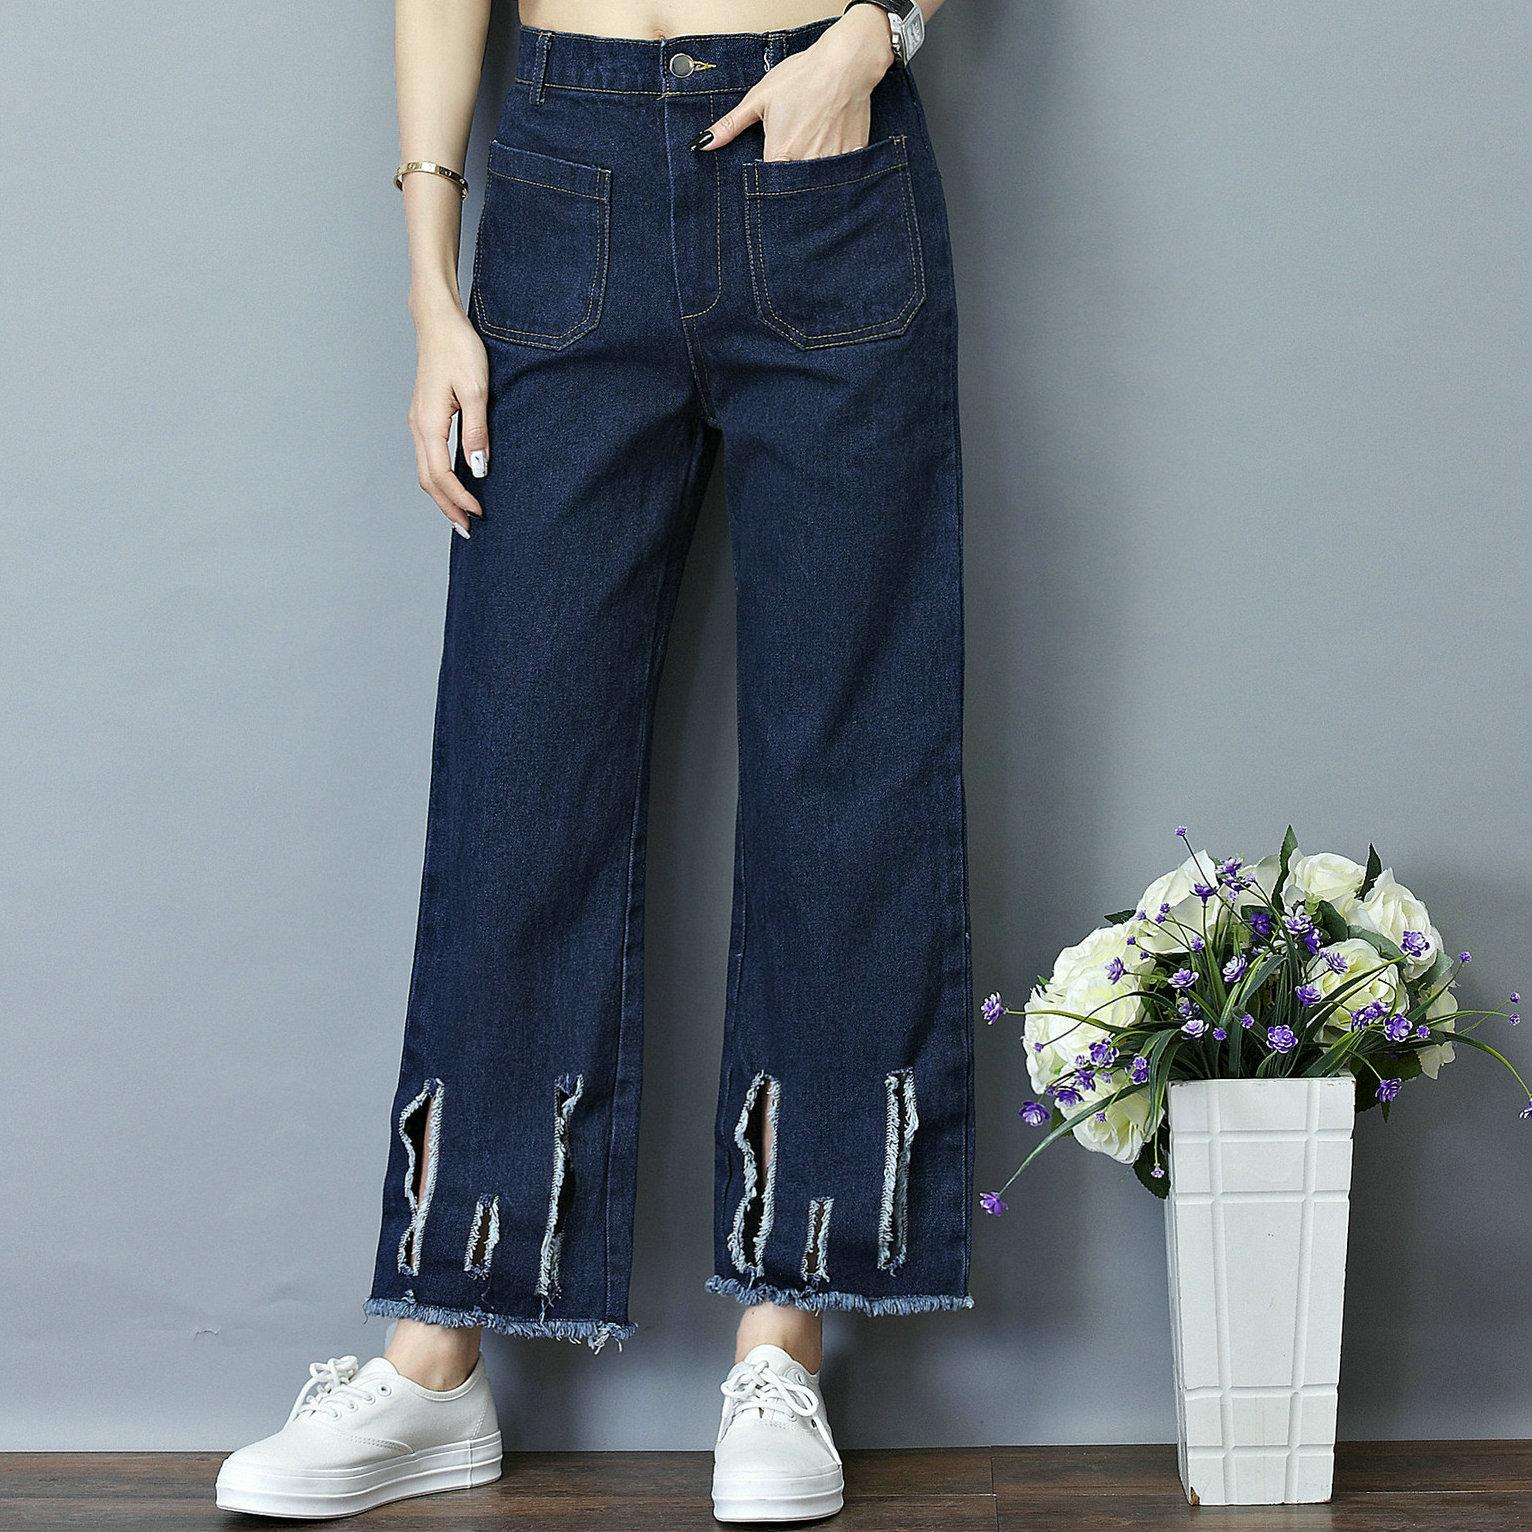 plus size denim jeans panty women spring autumn 2017 bermuda feminina loose hole jeans harlan denim pants female A1563Одежда и ак�е��уары<br><br><br>Aliexpress